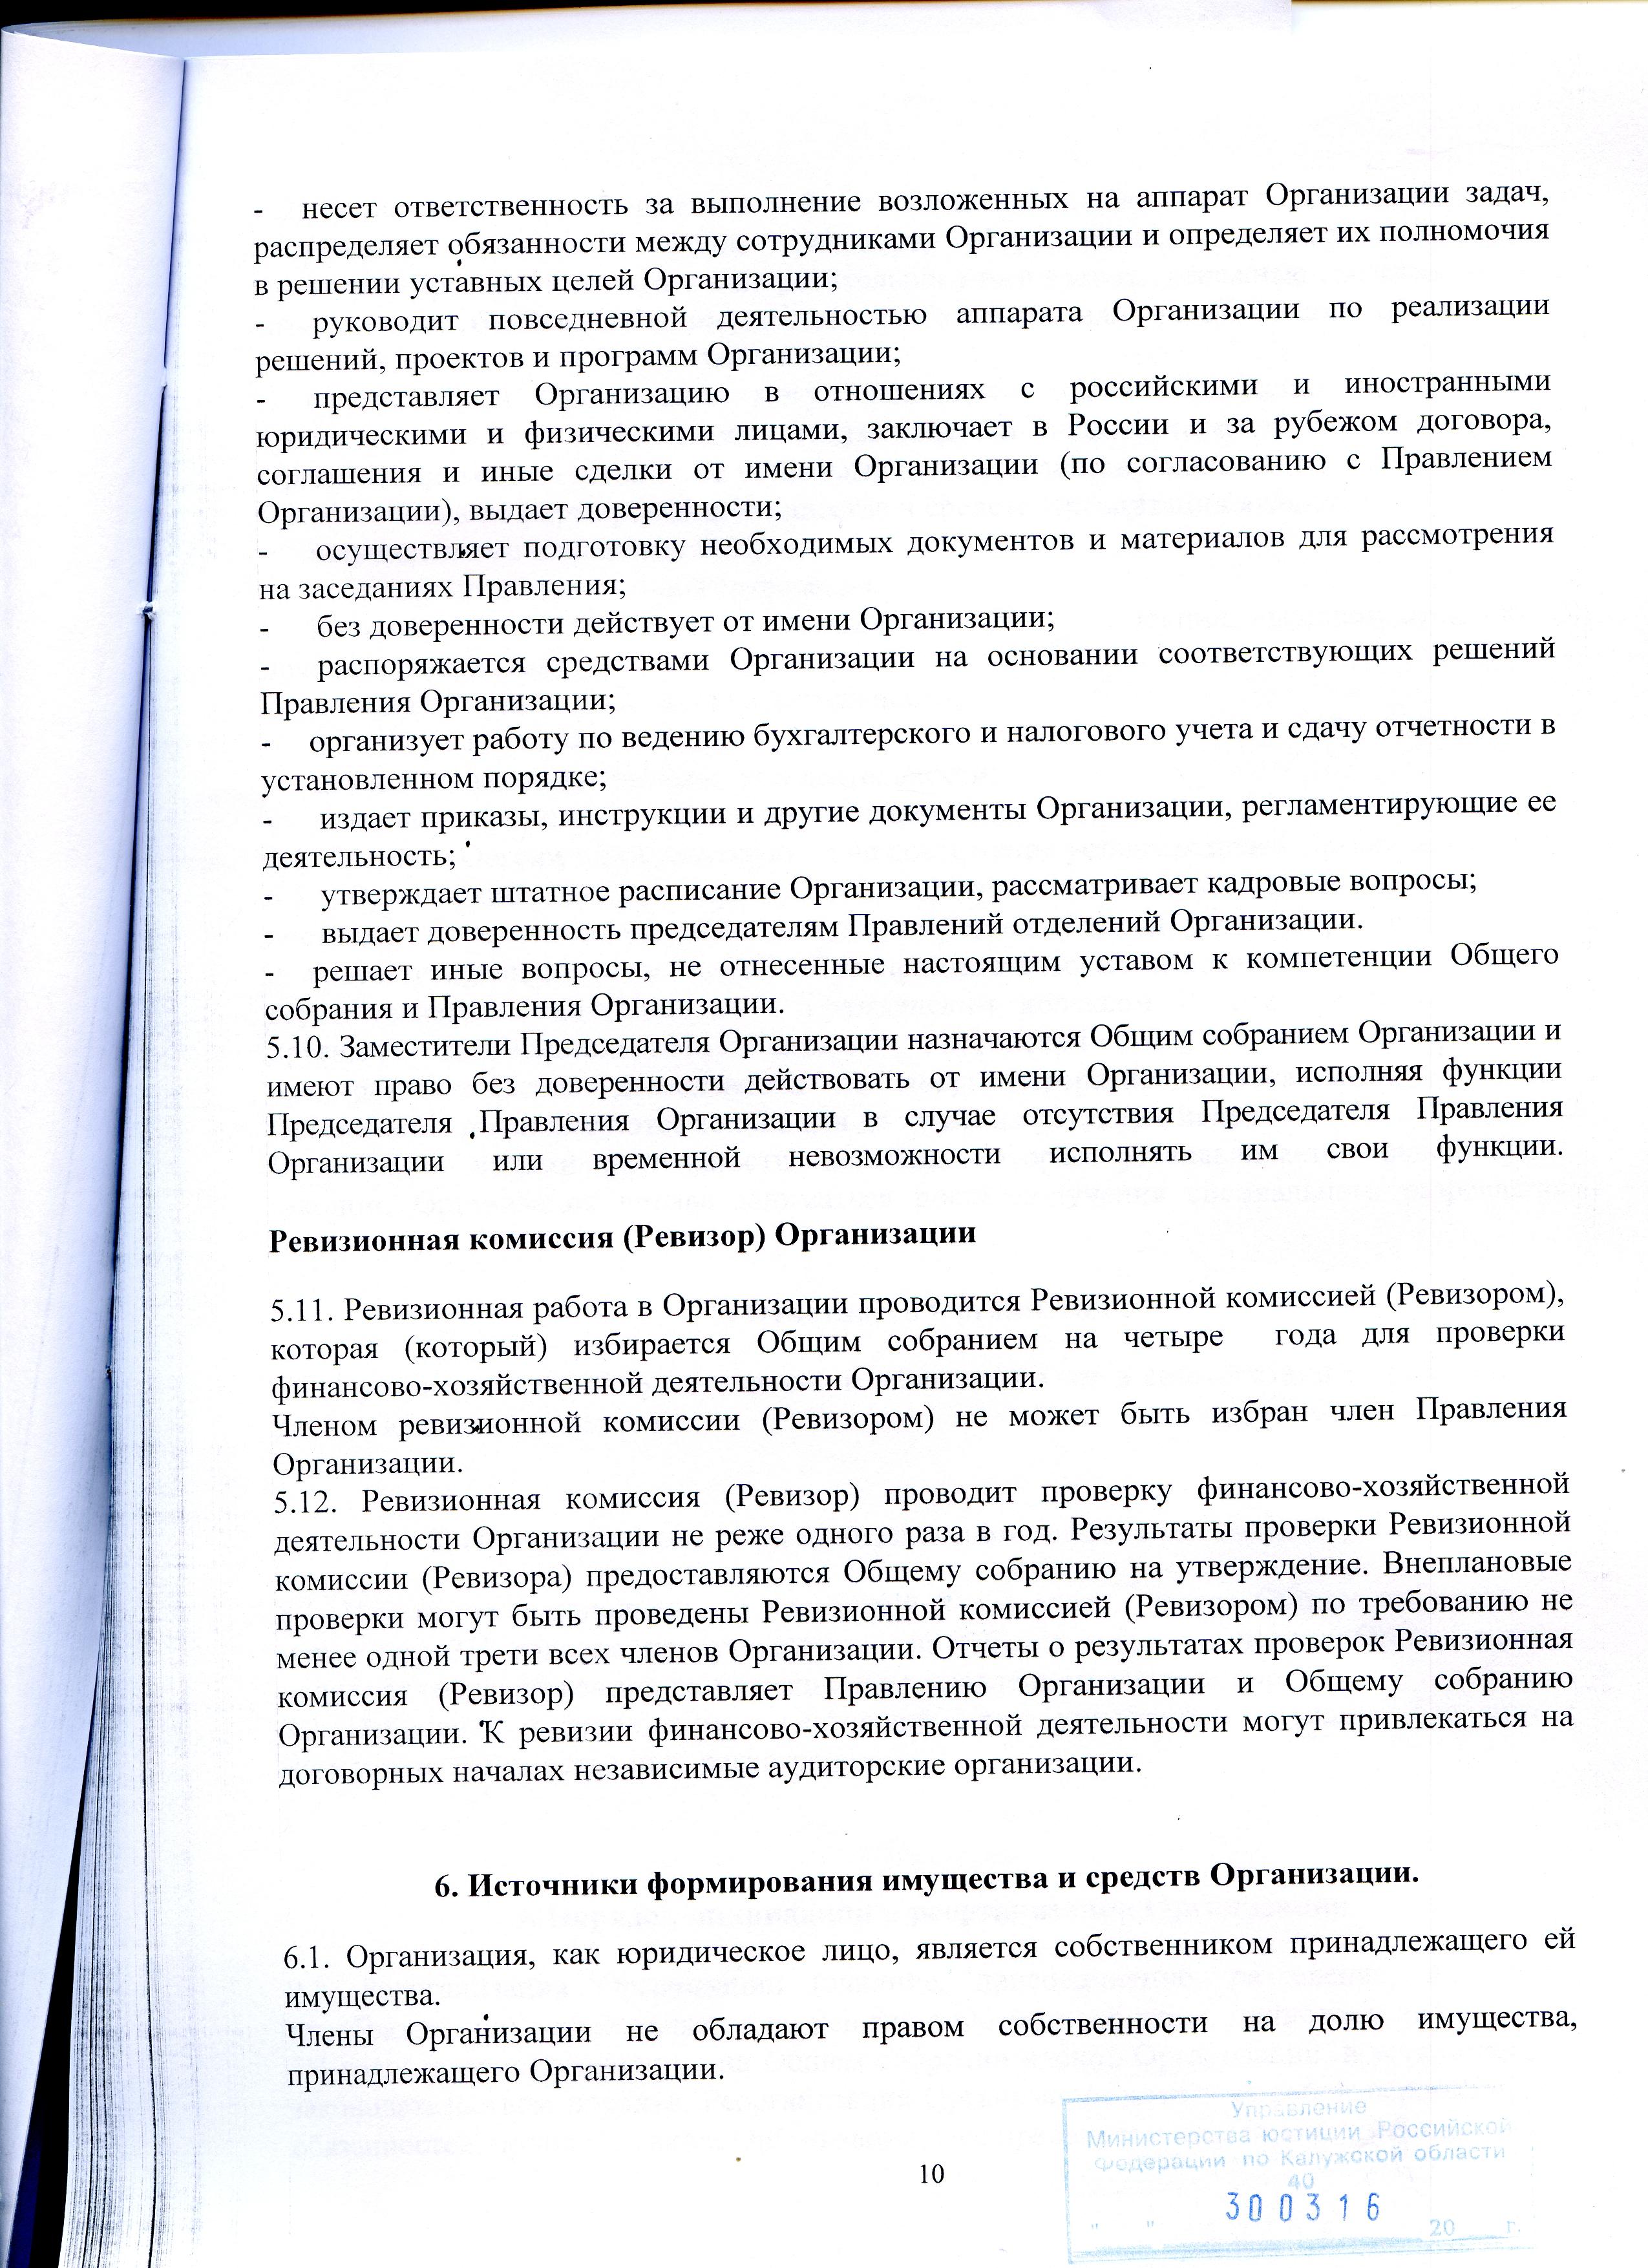 Устав НД 2 редакция072